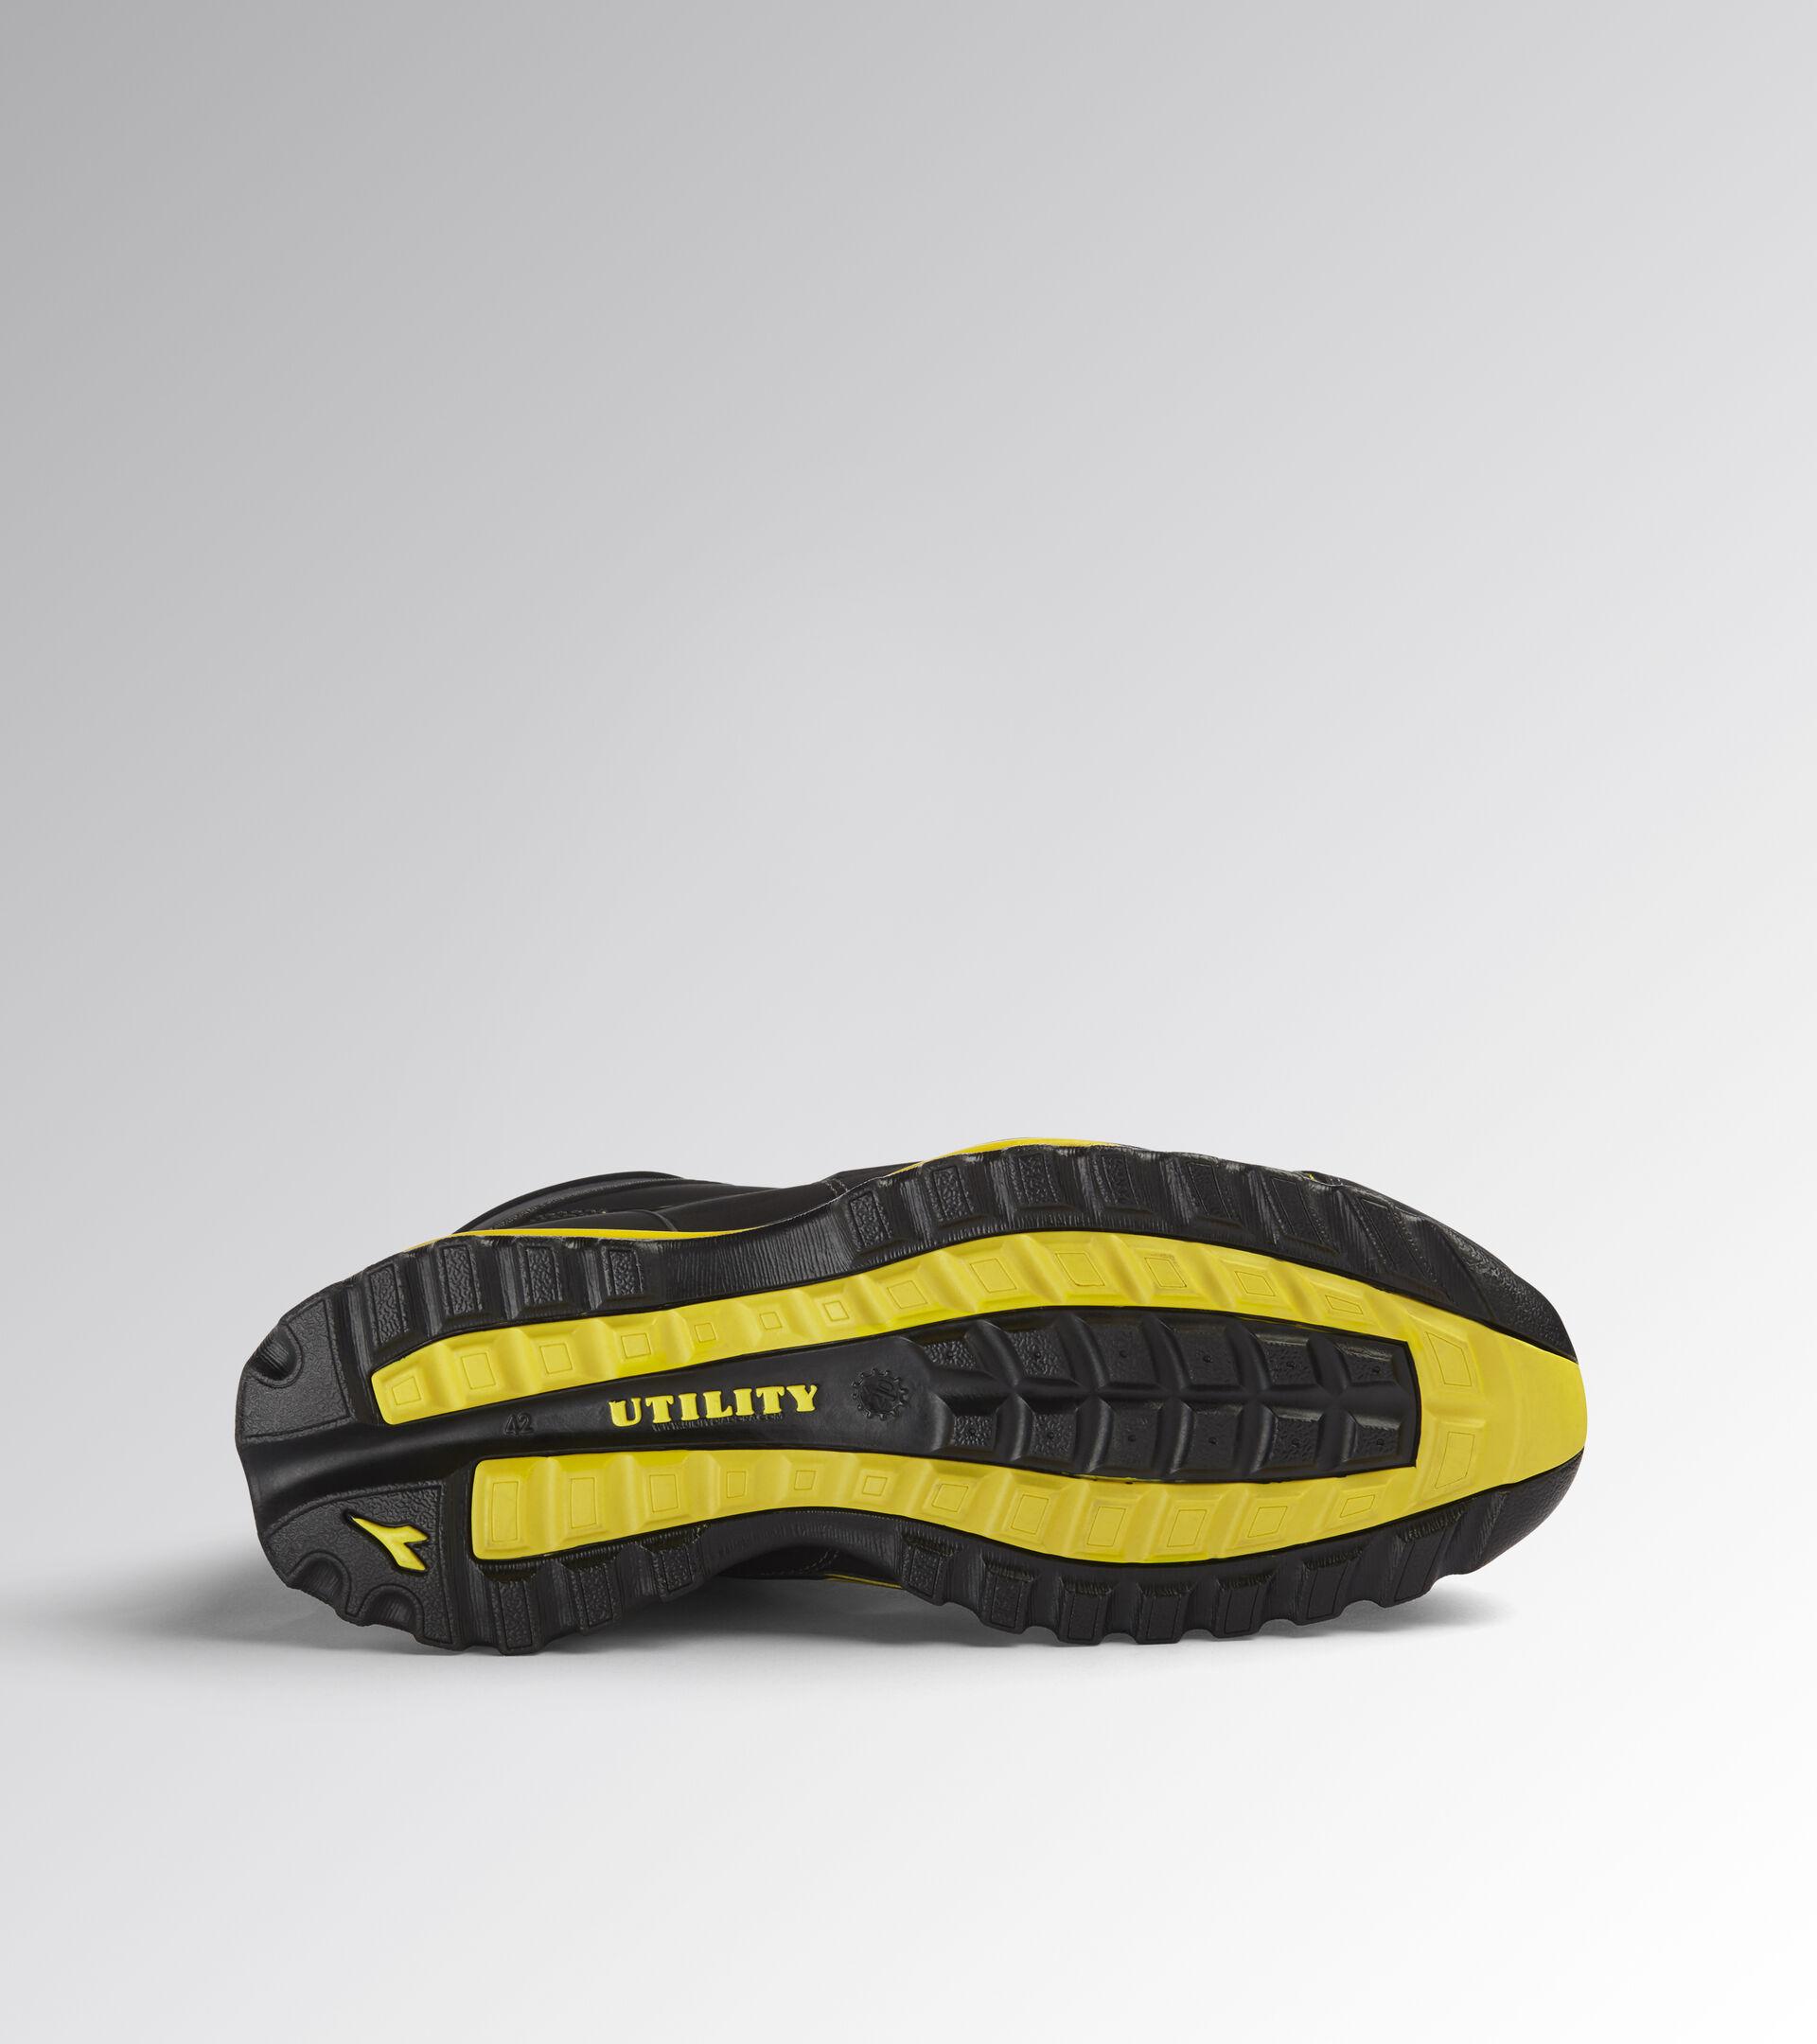 Footwear Utility UNISEX GLOVE MID S3 HRO SRA BLACK Utility